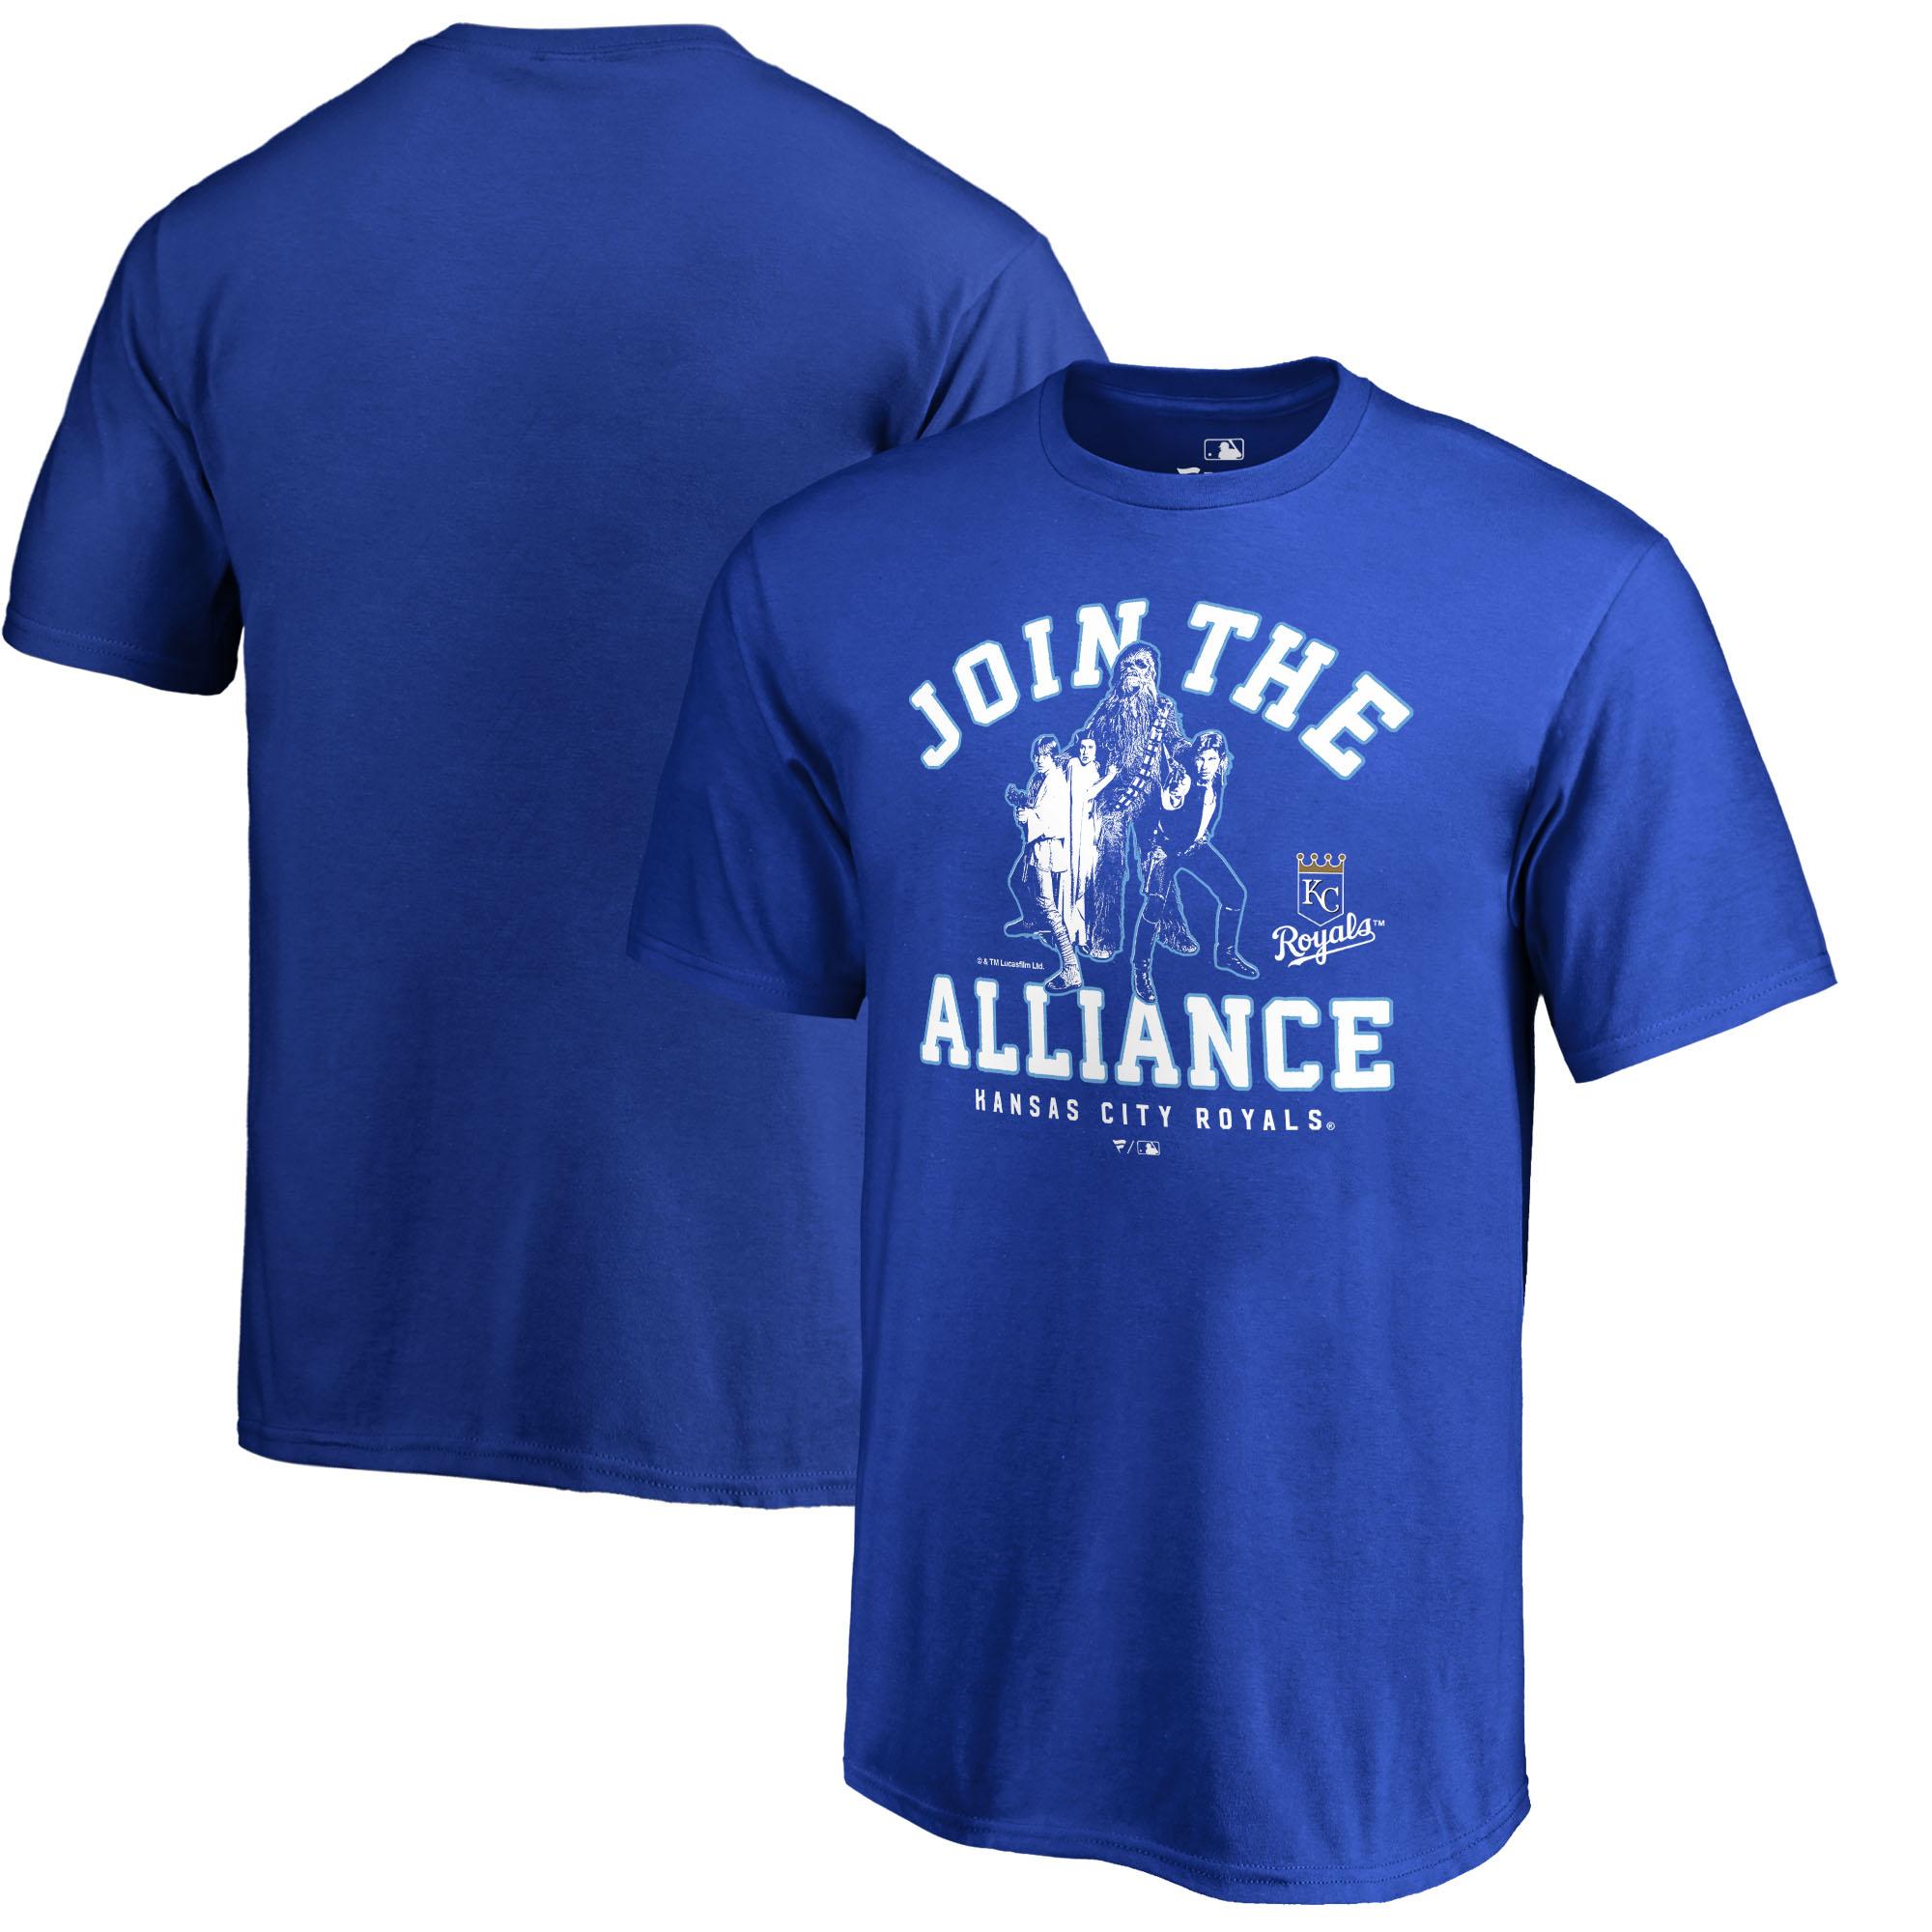 Kansas City Royals Fanatics Branded Youth MLB Star Wars Join The Alliance T-Shirt - Royal